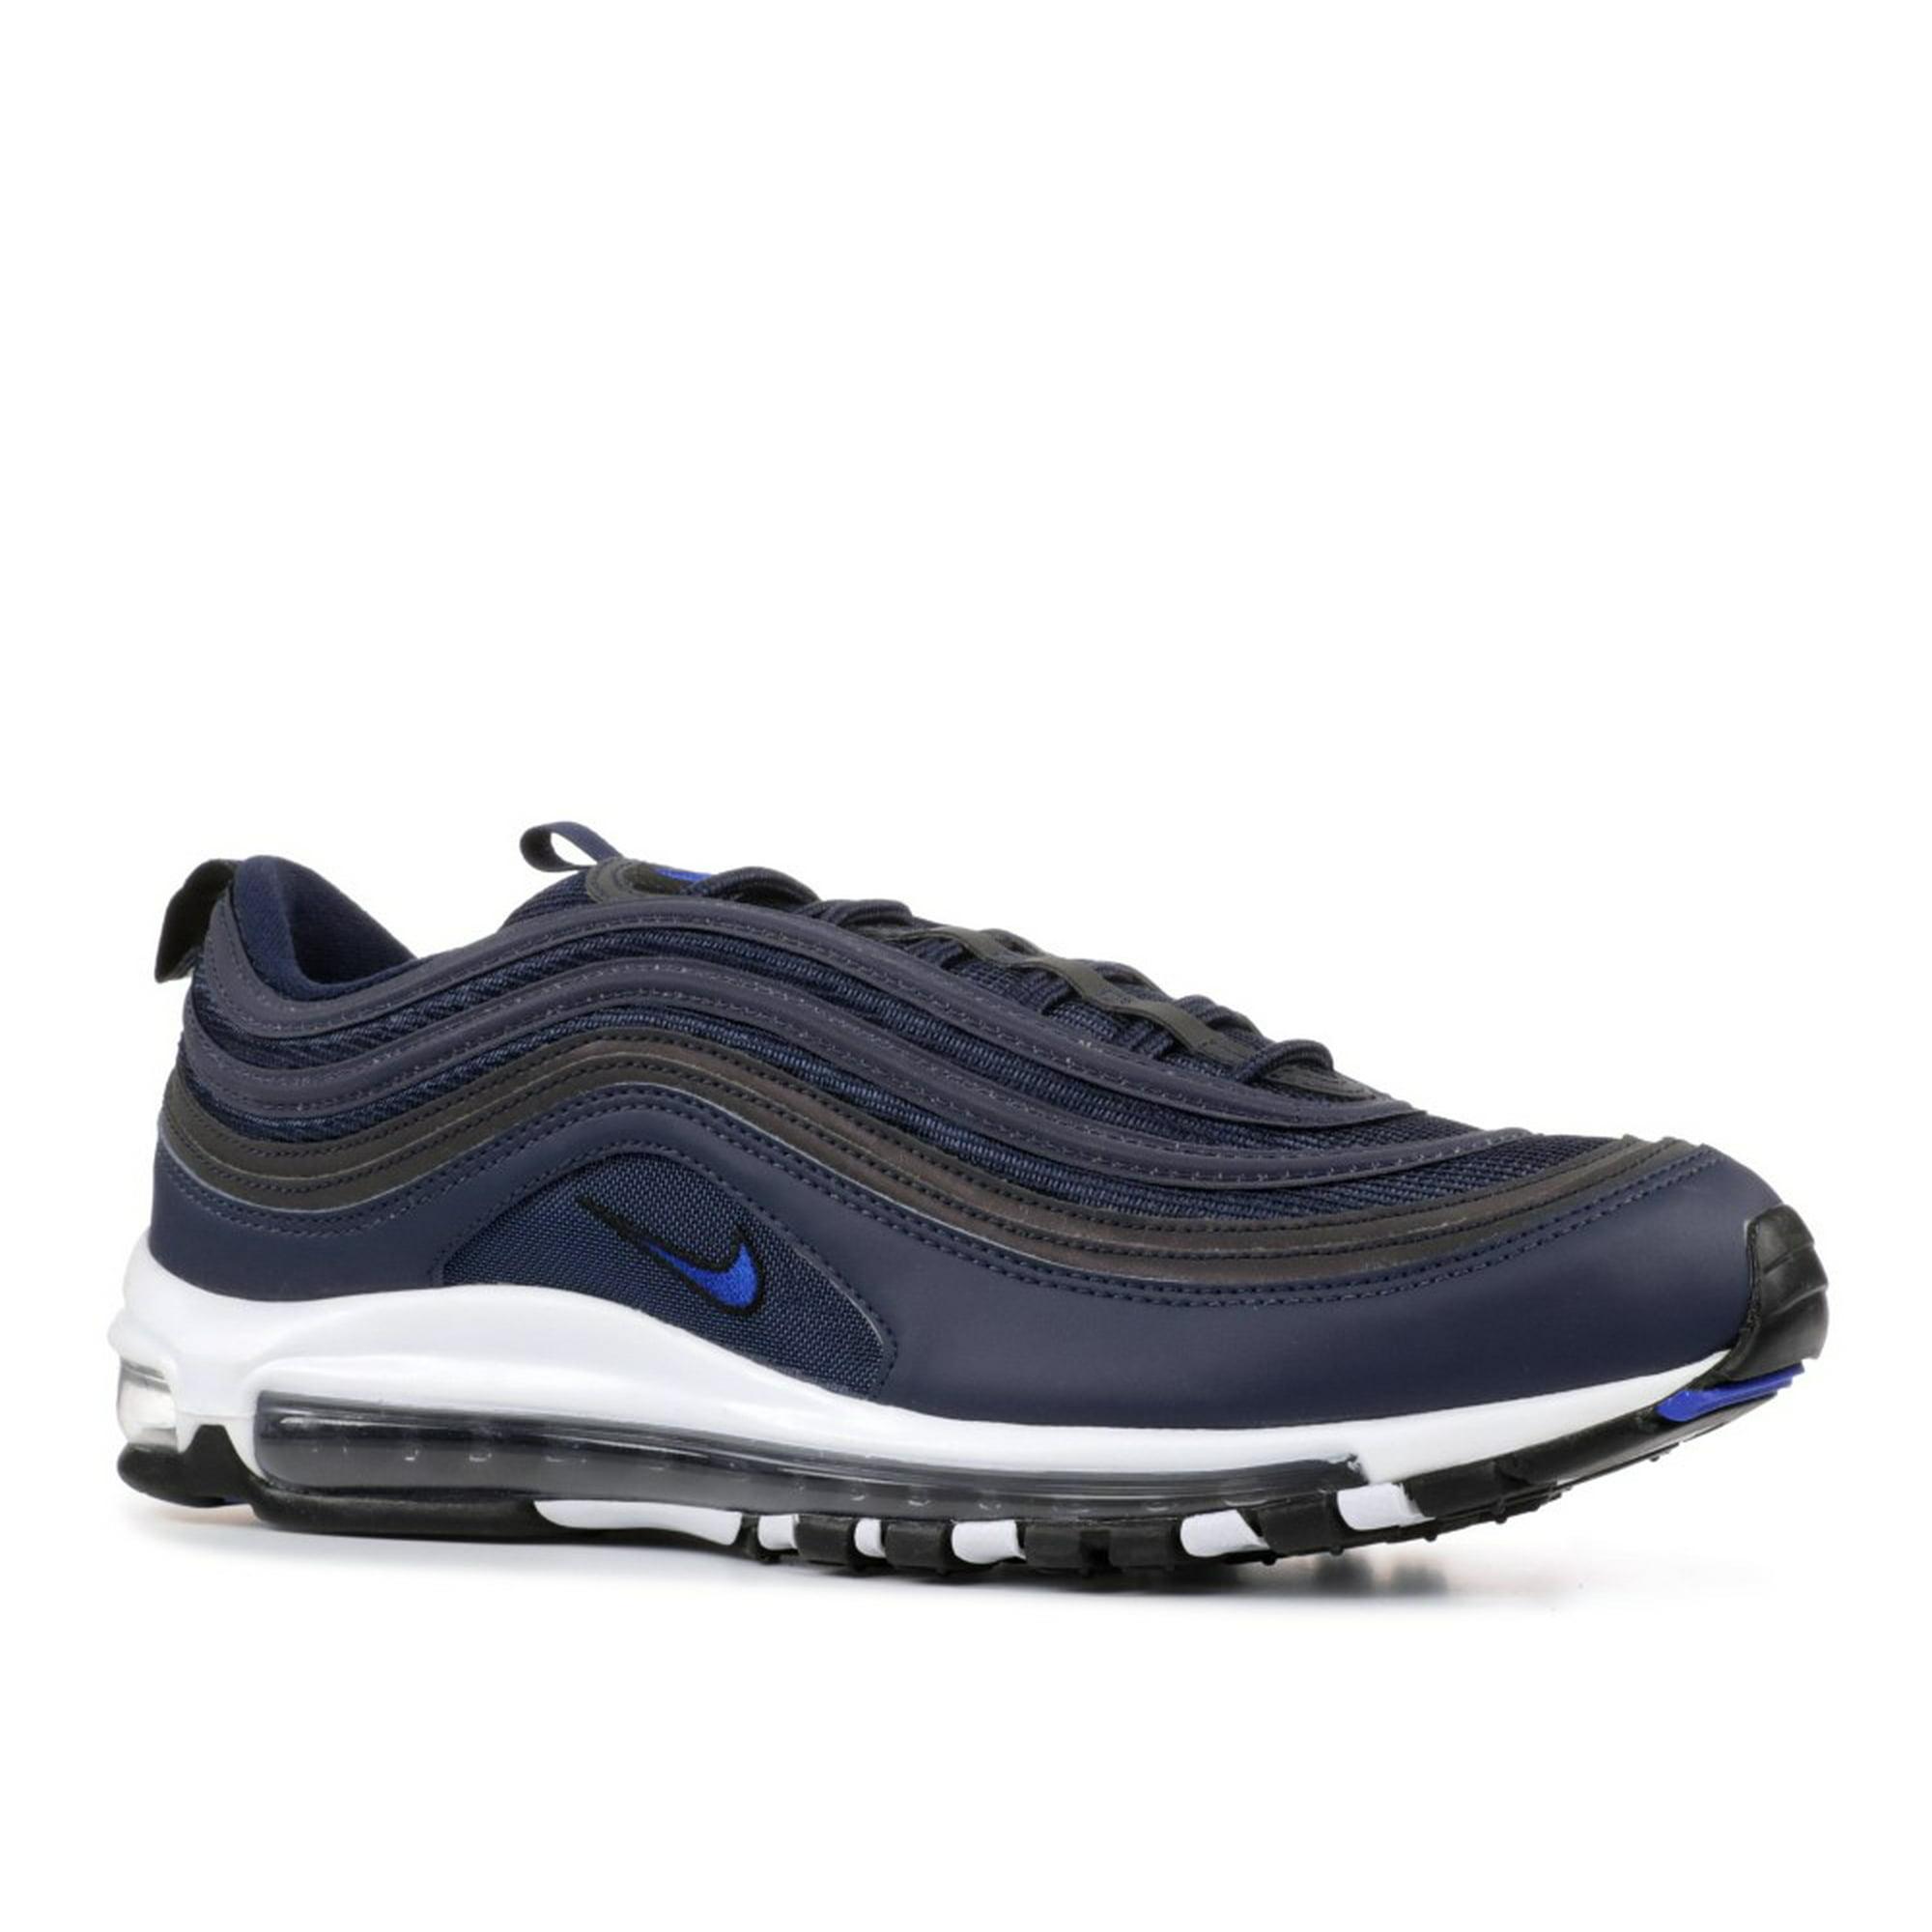 e8935557a5ff Nike - Men - Nike Air Max 97 - 921826-402 - Size 7